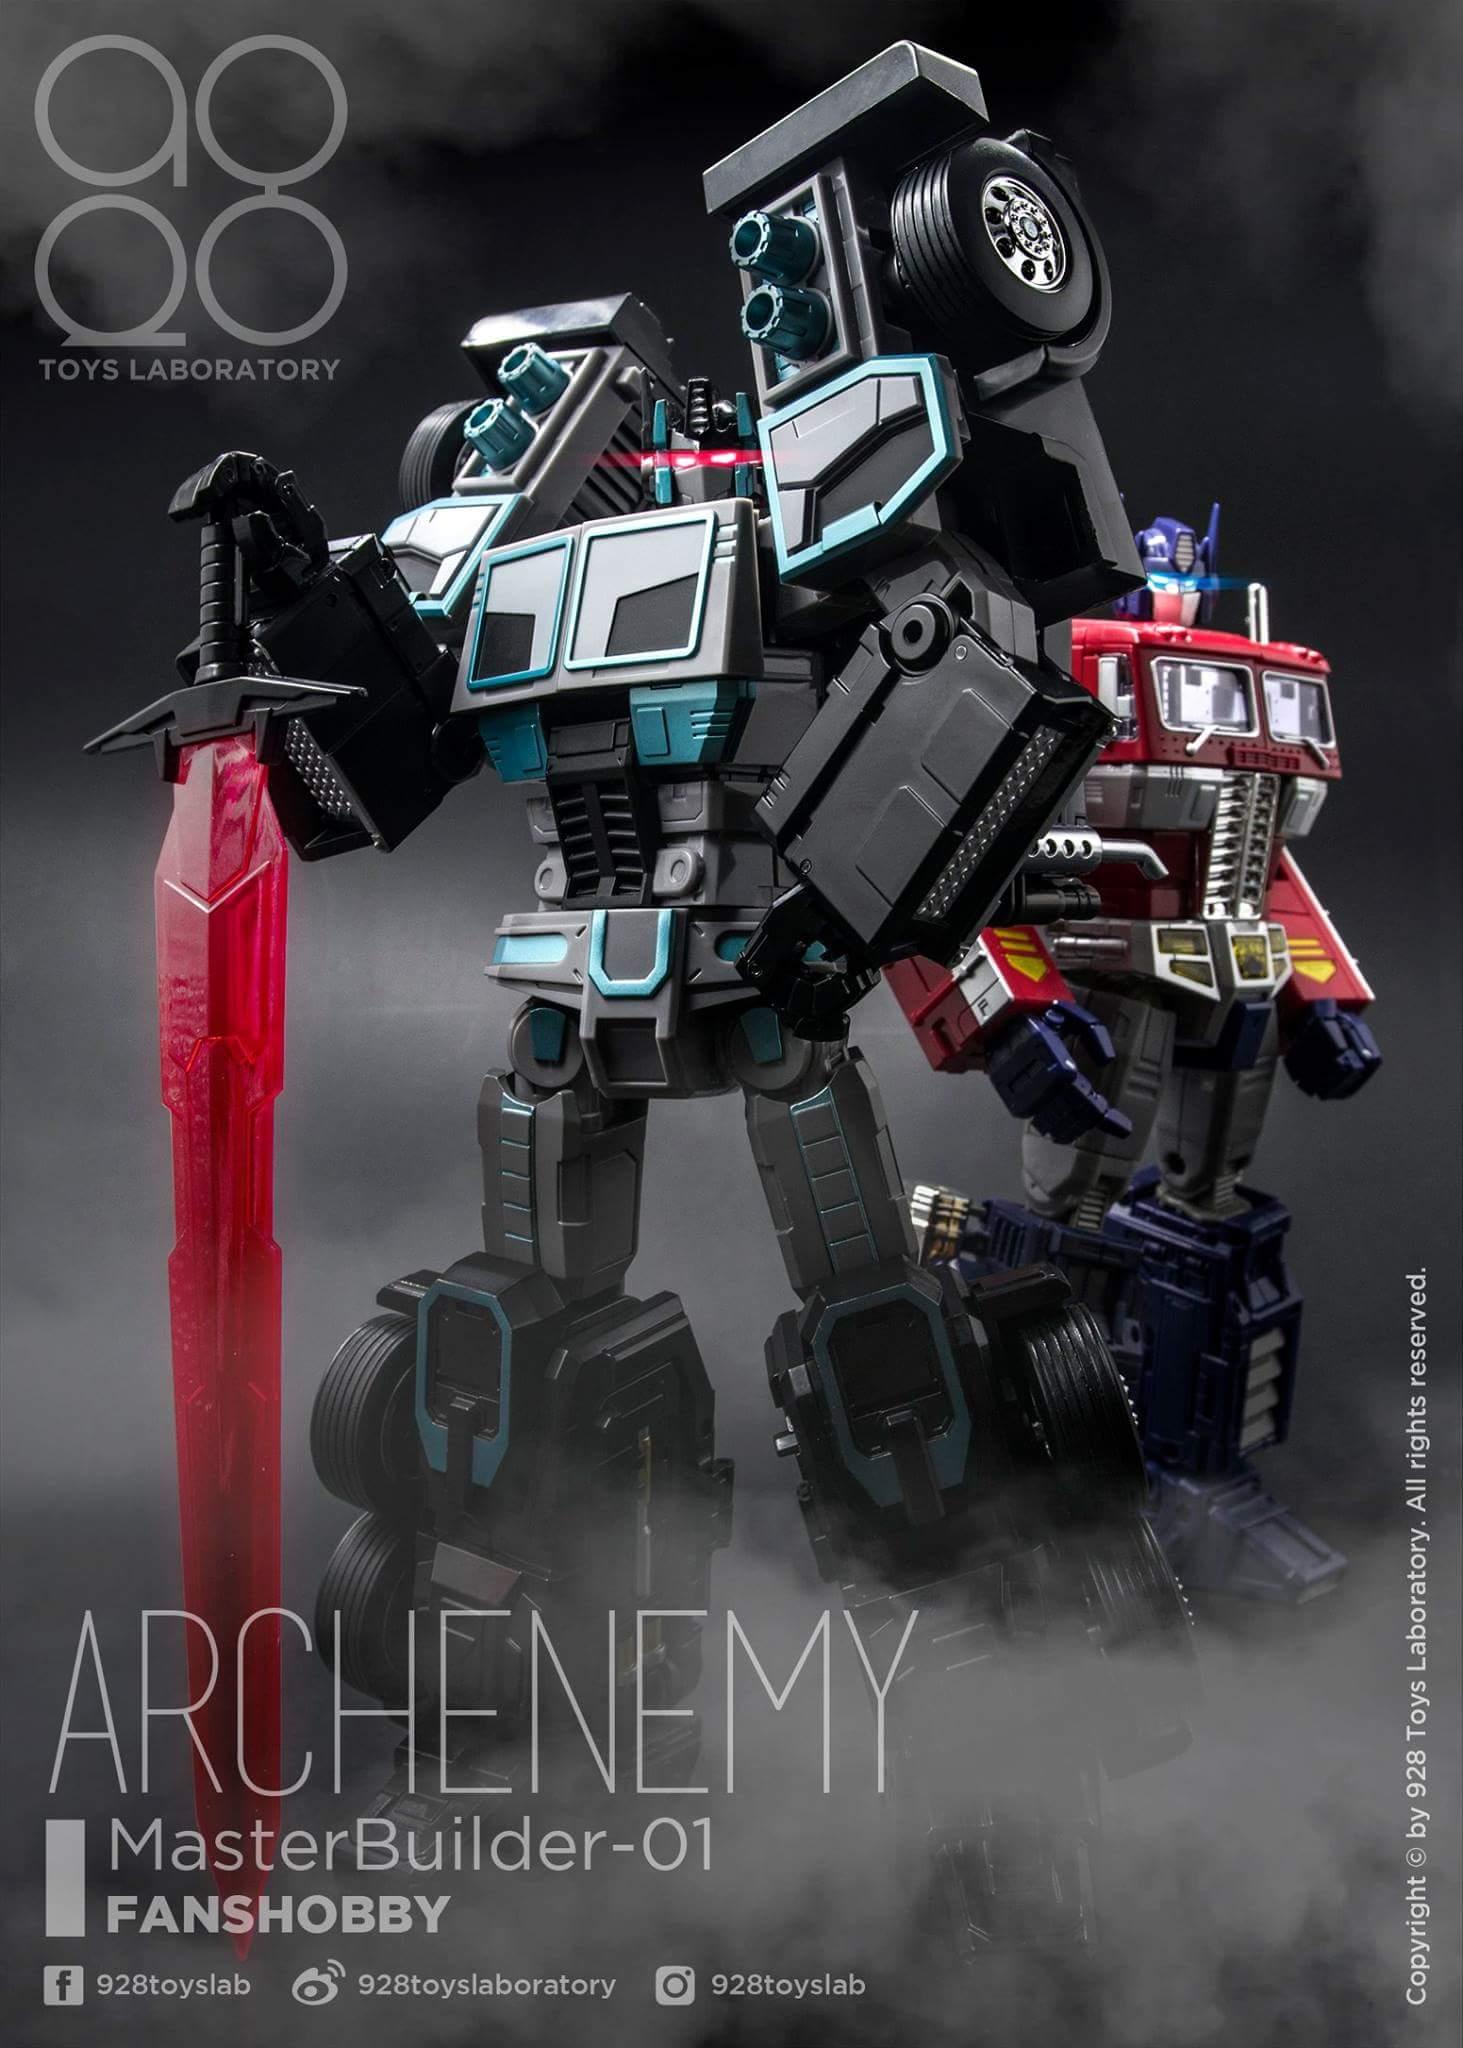 [FansHobby] Produit Tiers - Master Builder MB-01 Archenemy (aka Scourge RID 2000),  MB-04 Gunfighter II (aka Laser Optimus G2) et MB-09 Trailer (remorque) Idj8y4ds